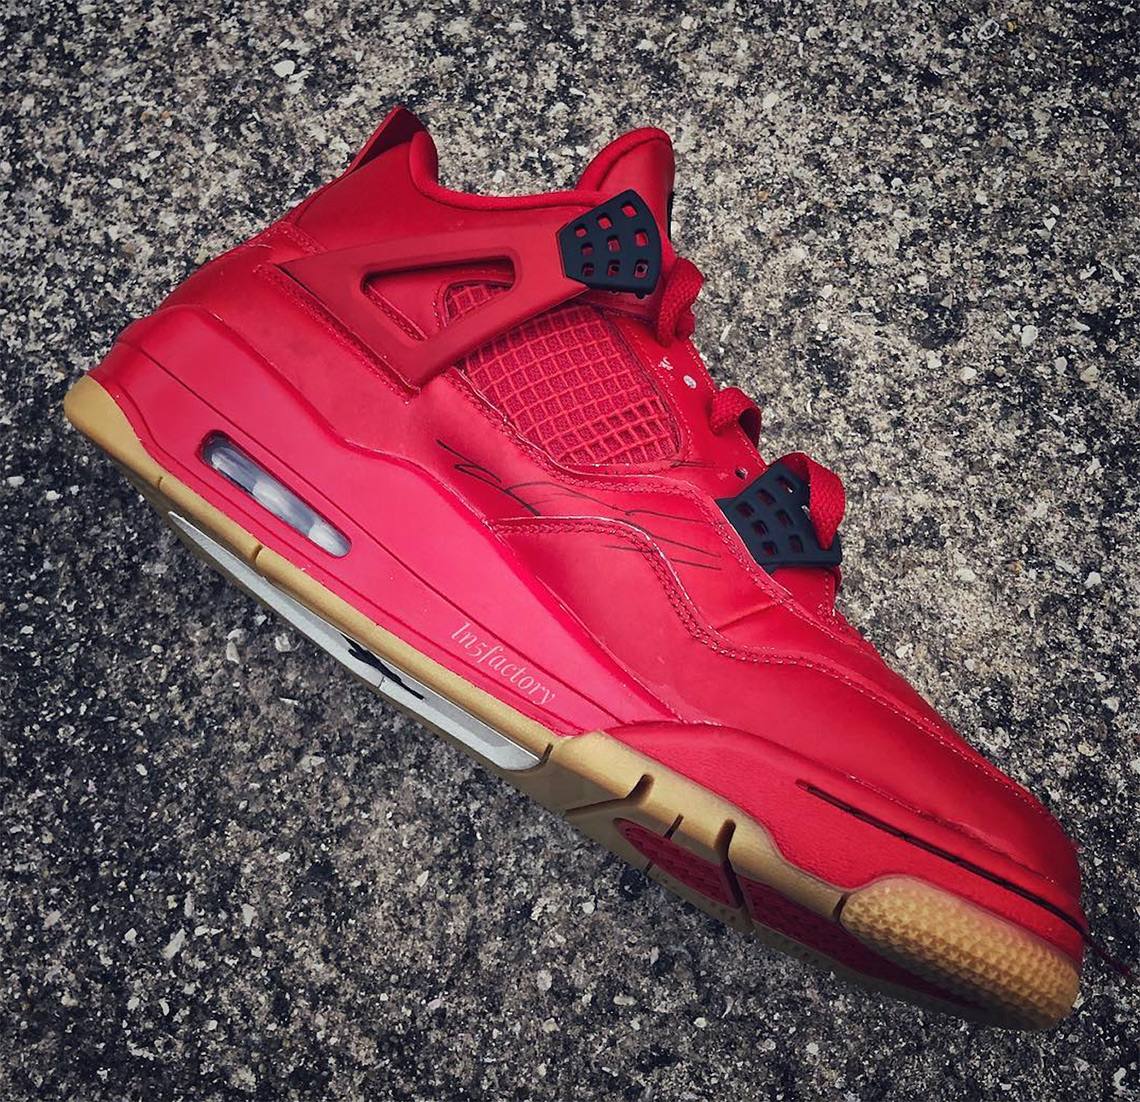 db6371b30172 Air Jordan 4 Red Gum 2019 Release Info